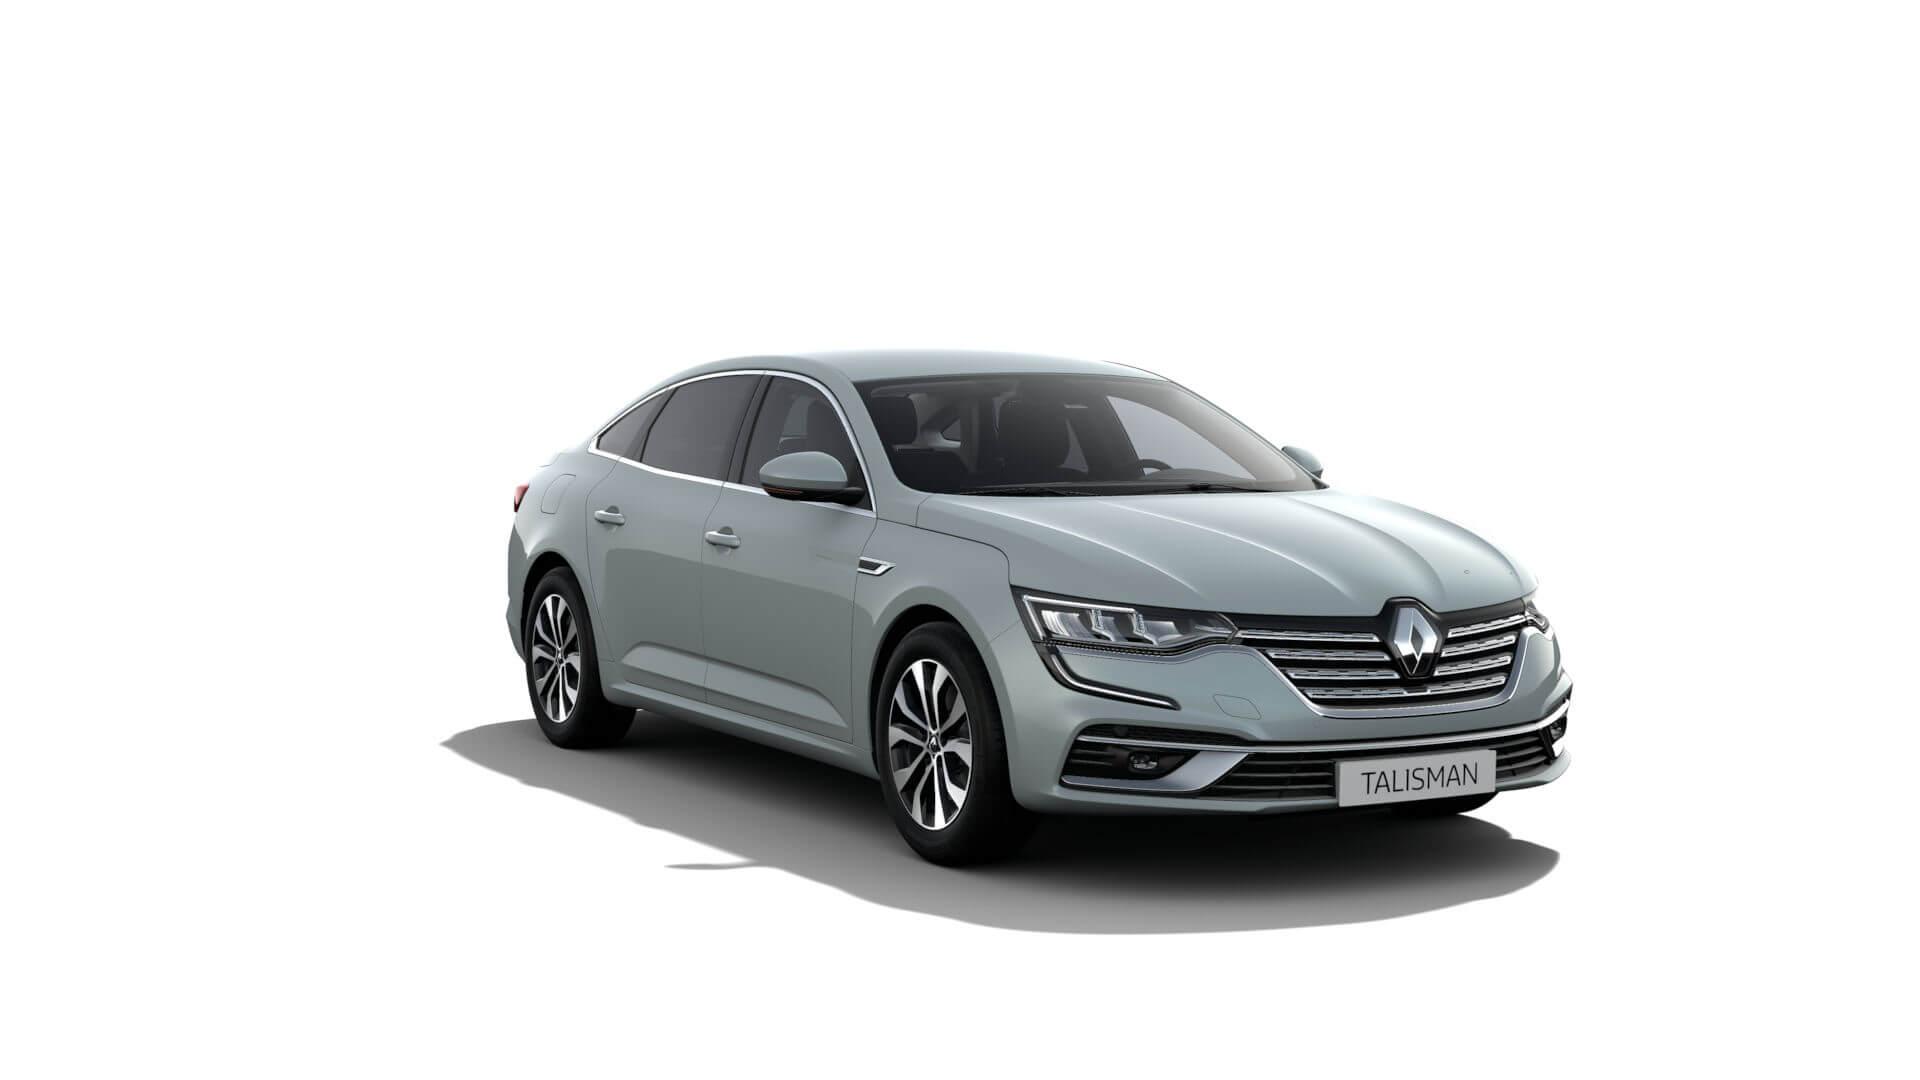 Automodell grau-türkis - Renault Talisman - Renault Ahrens Hannover